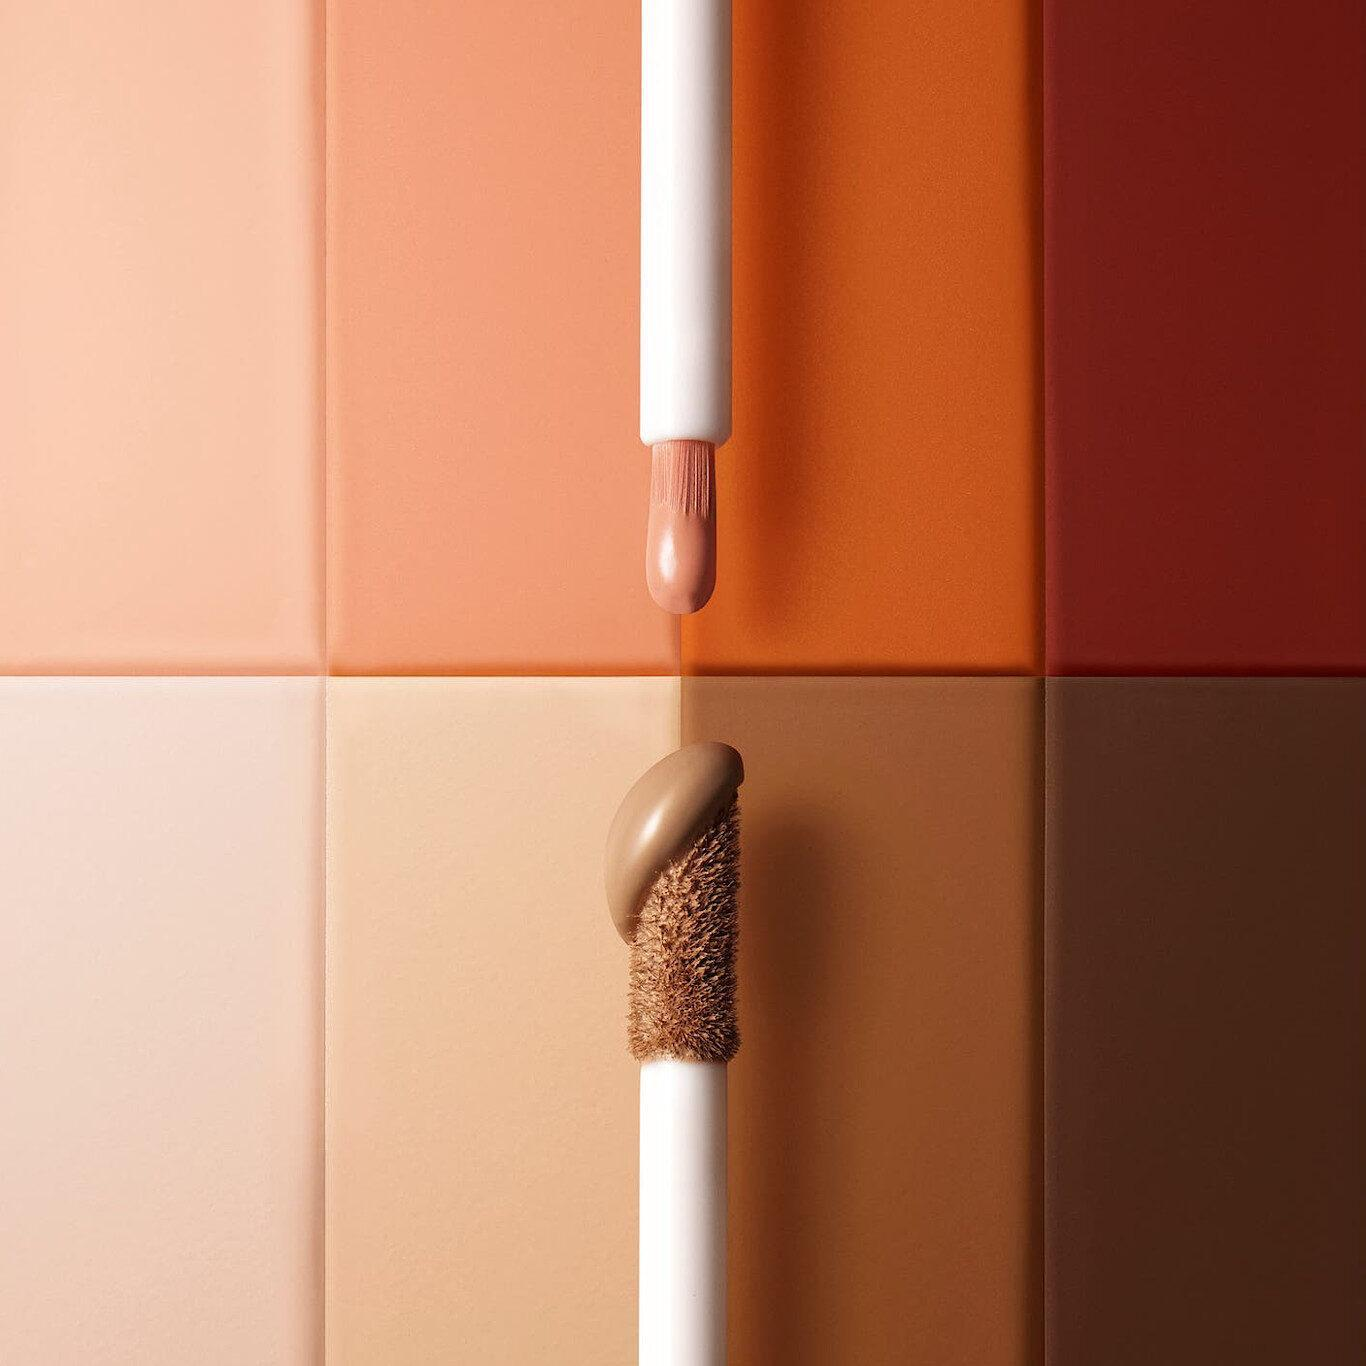 NARS Cosmetics Radiant Cream Color Corrector Post Cover